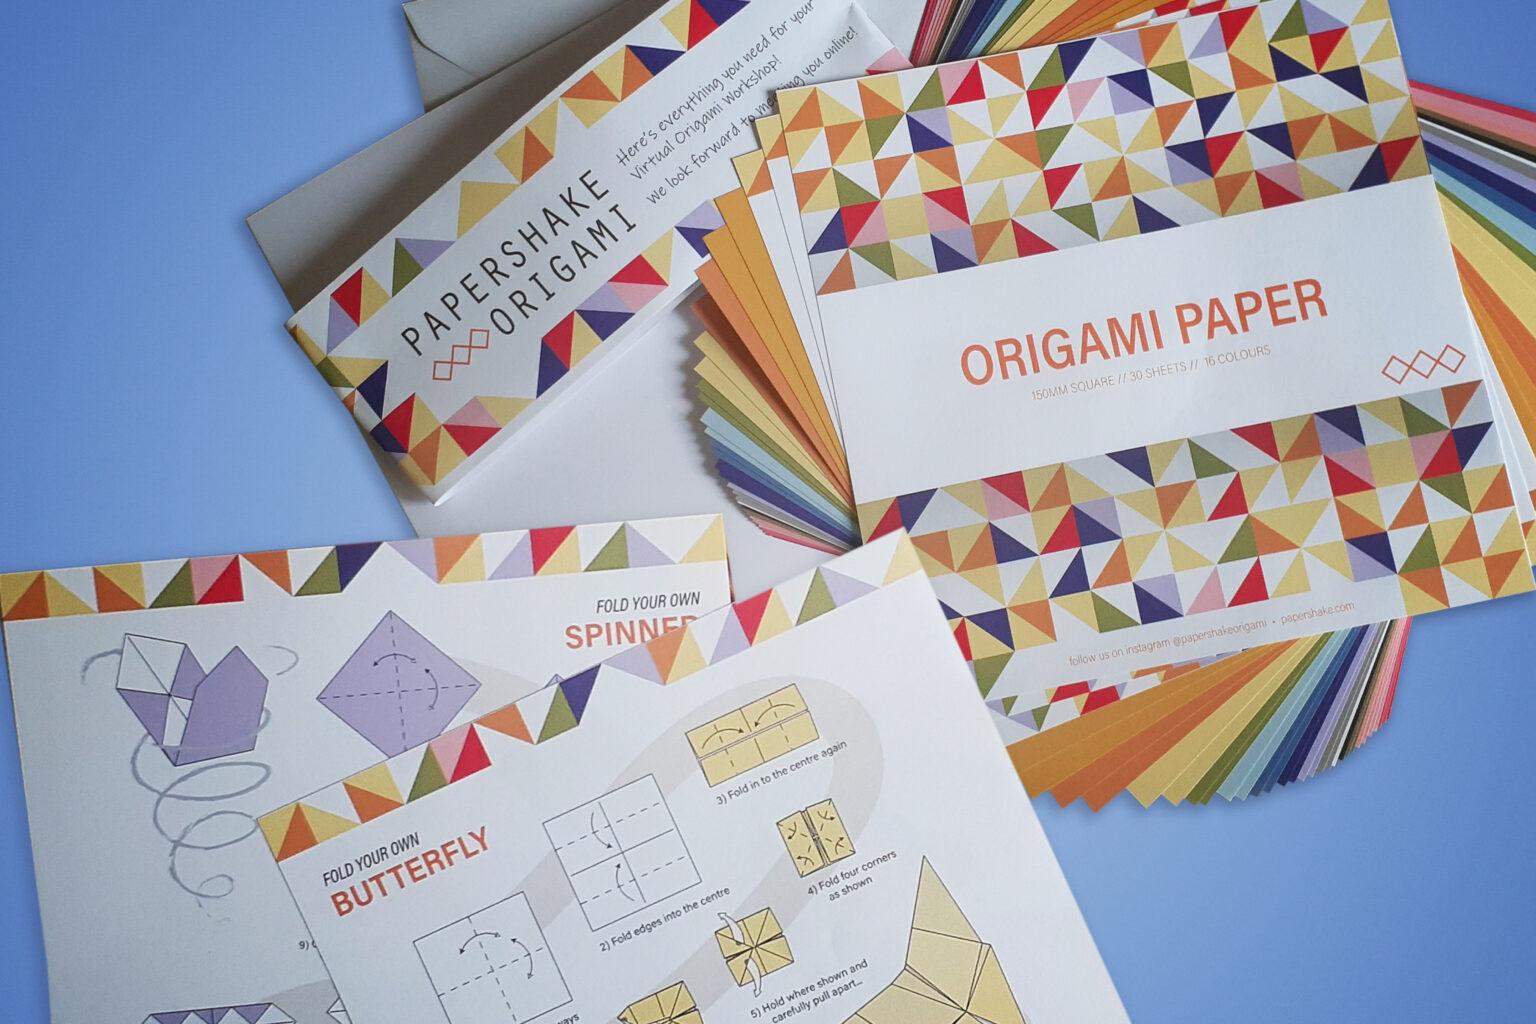 201 Origami Packs (5)s